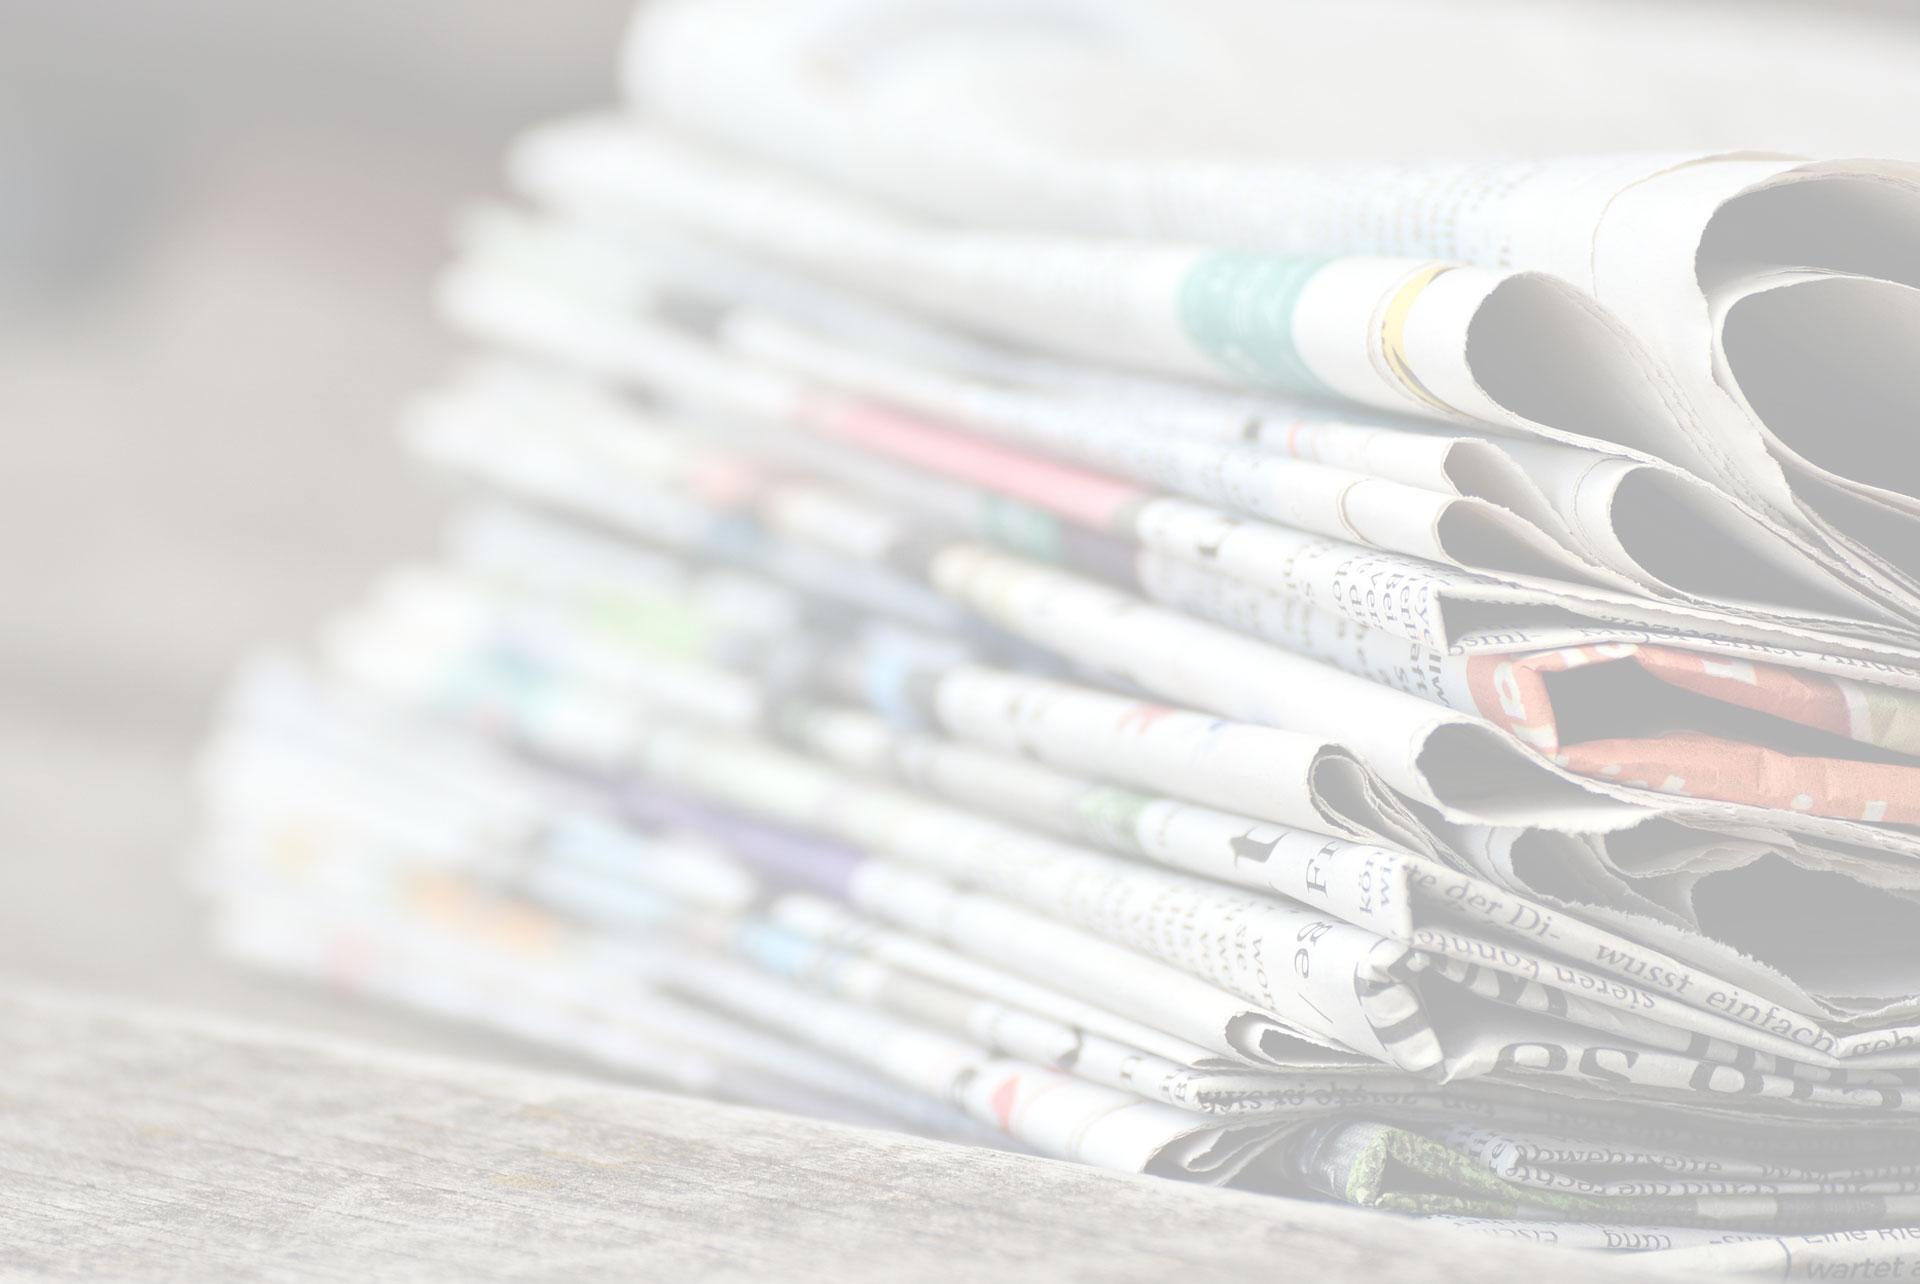 Manuela Sangiorgi sindaca Imola